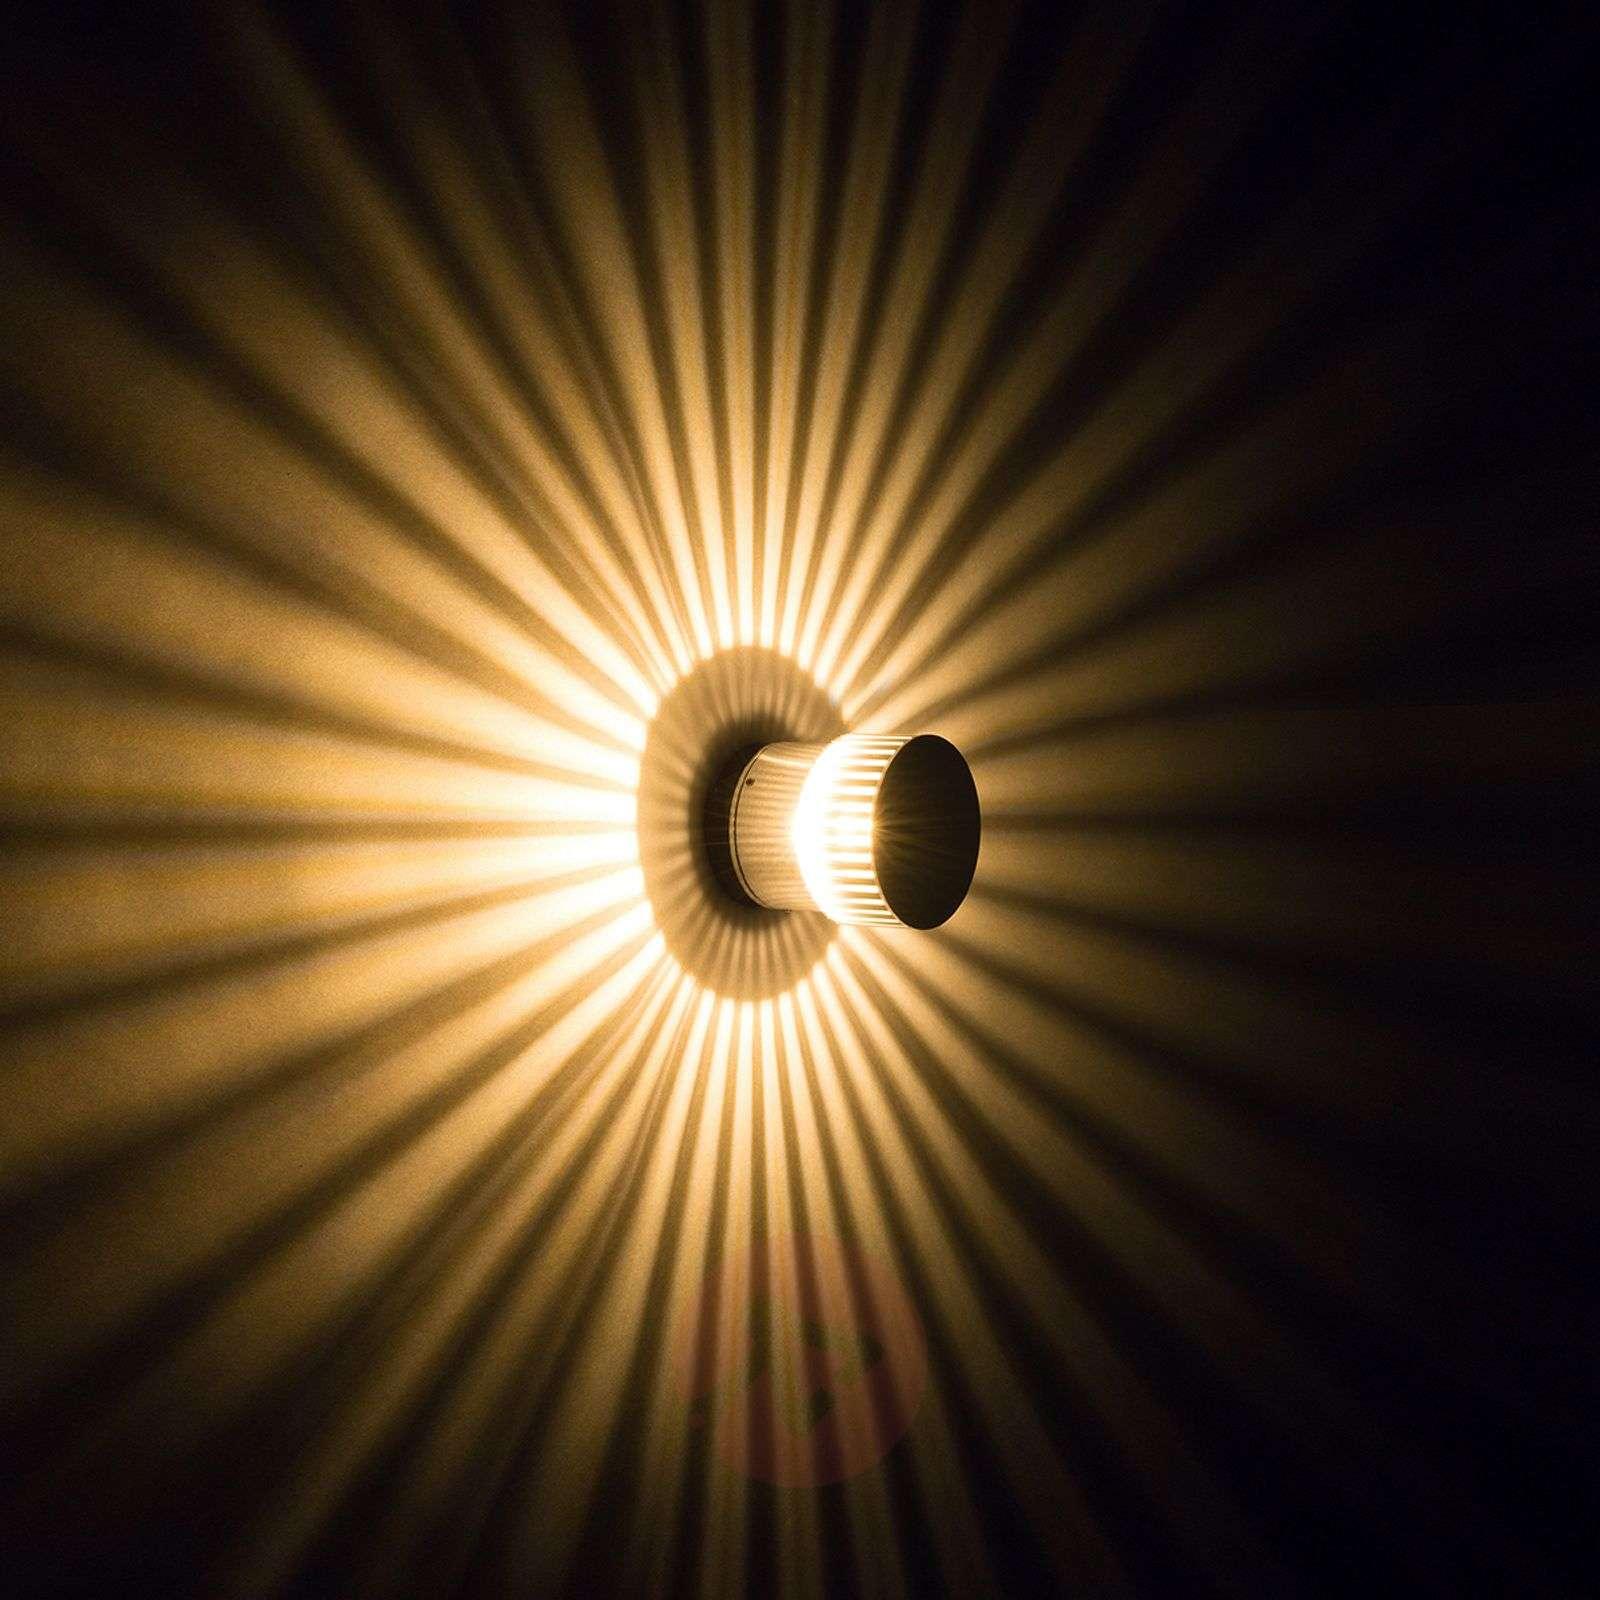 Corina striking LED outdoor wall light IP54-9505999-01